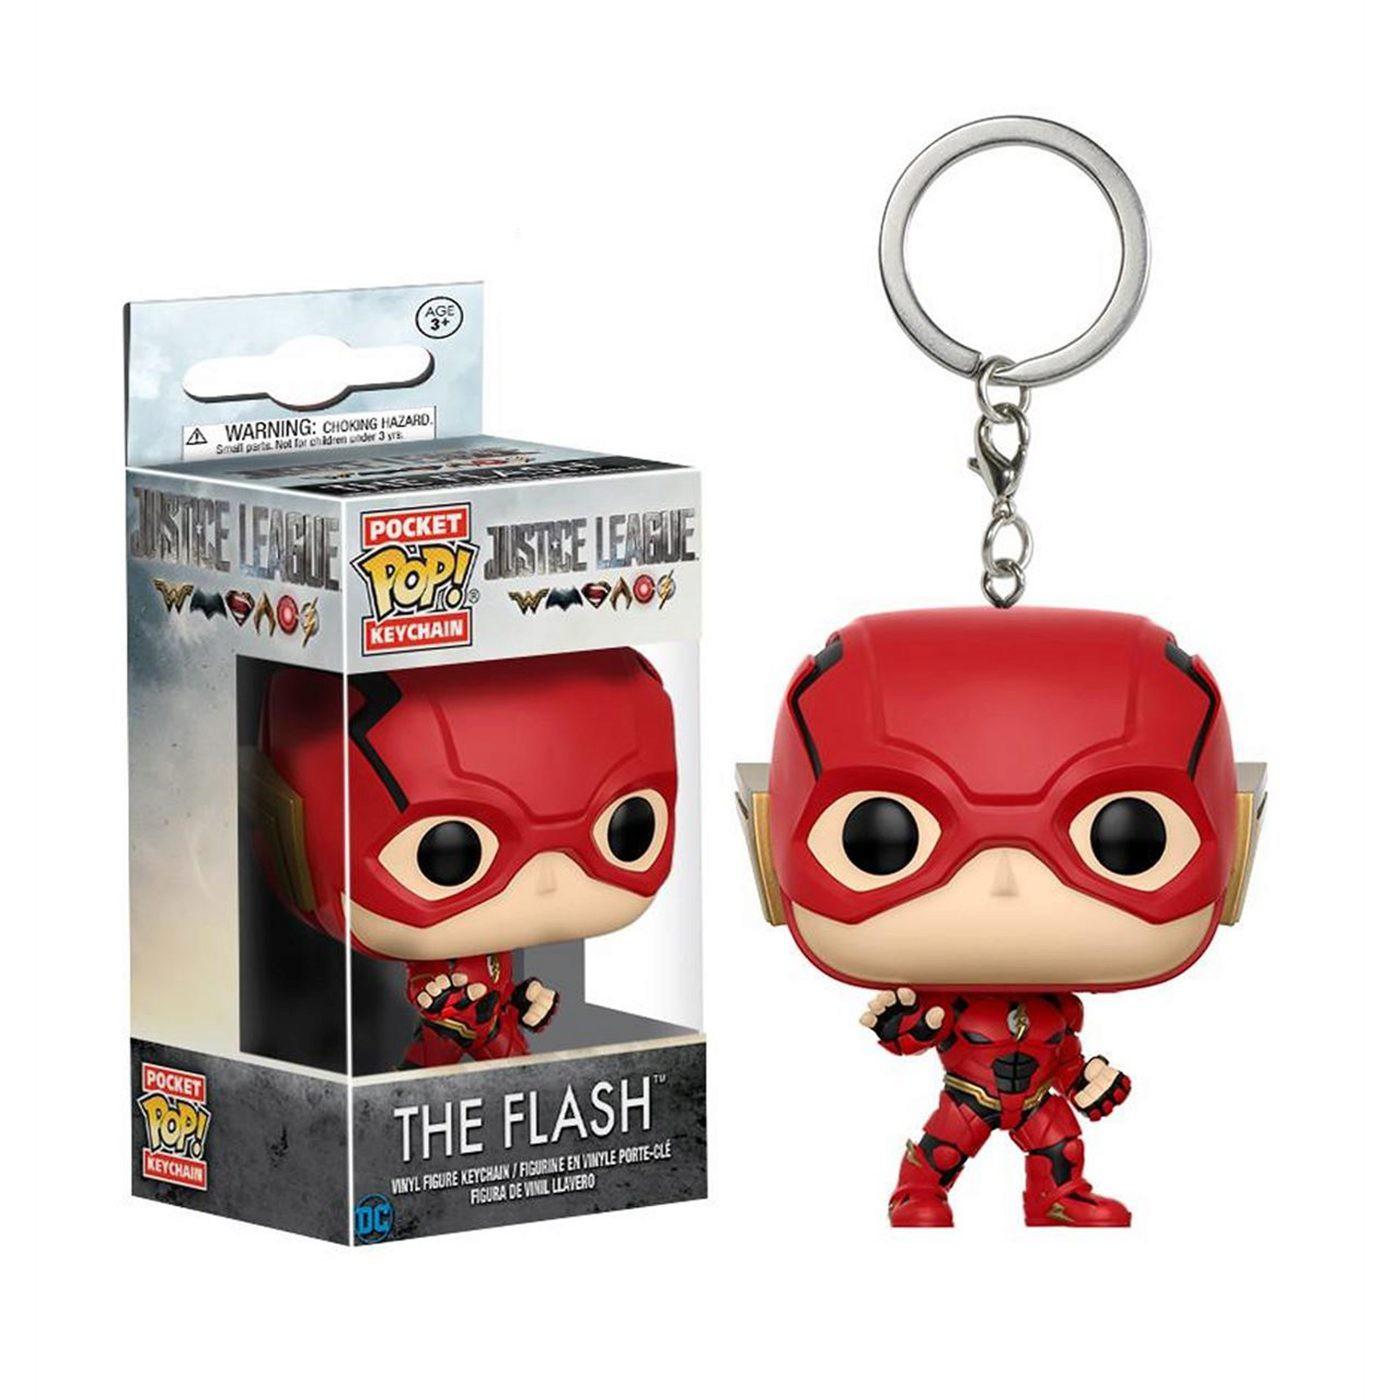 Flash Justice League Movie Pocket Pop Keychain